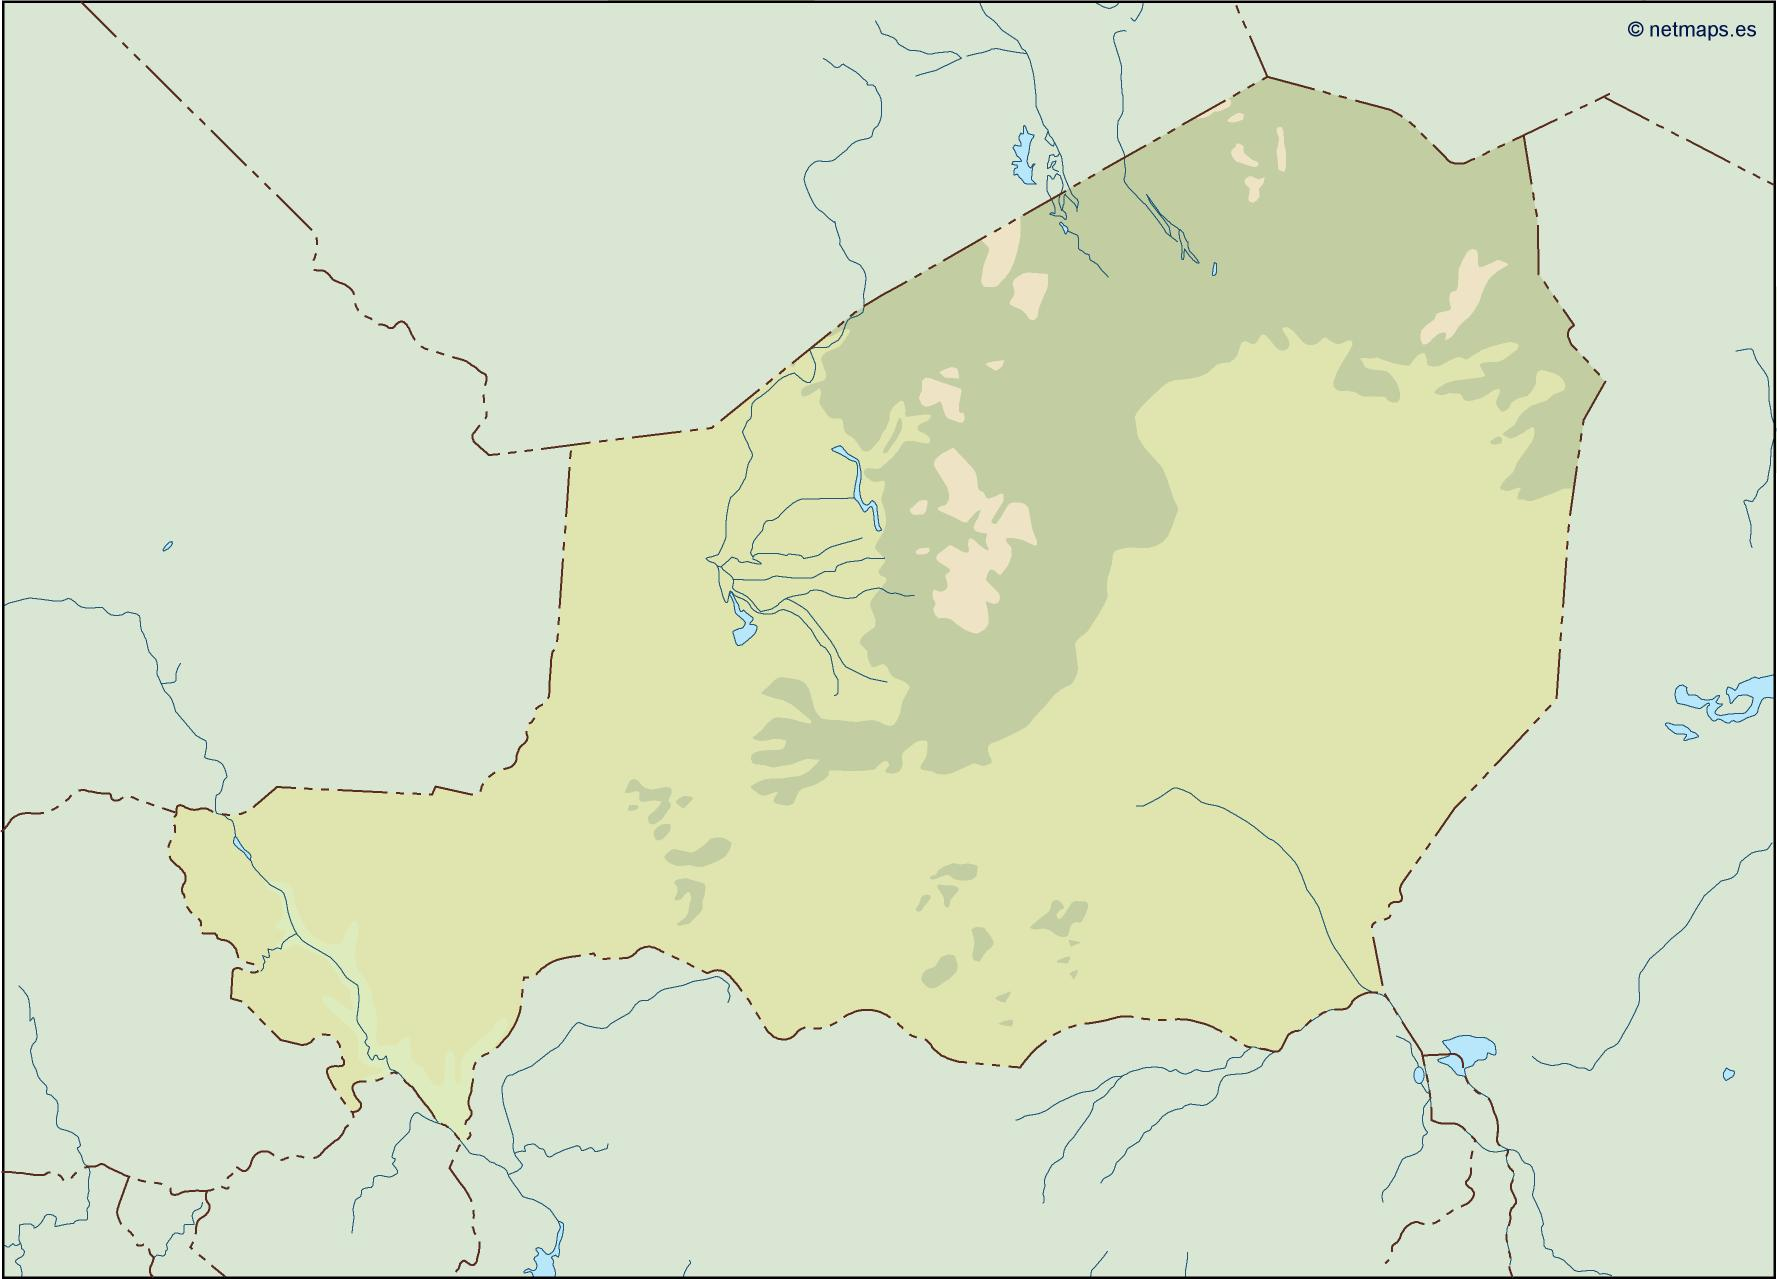 niger illustrator map